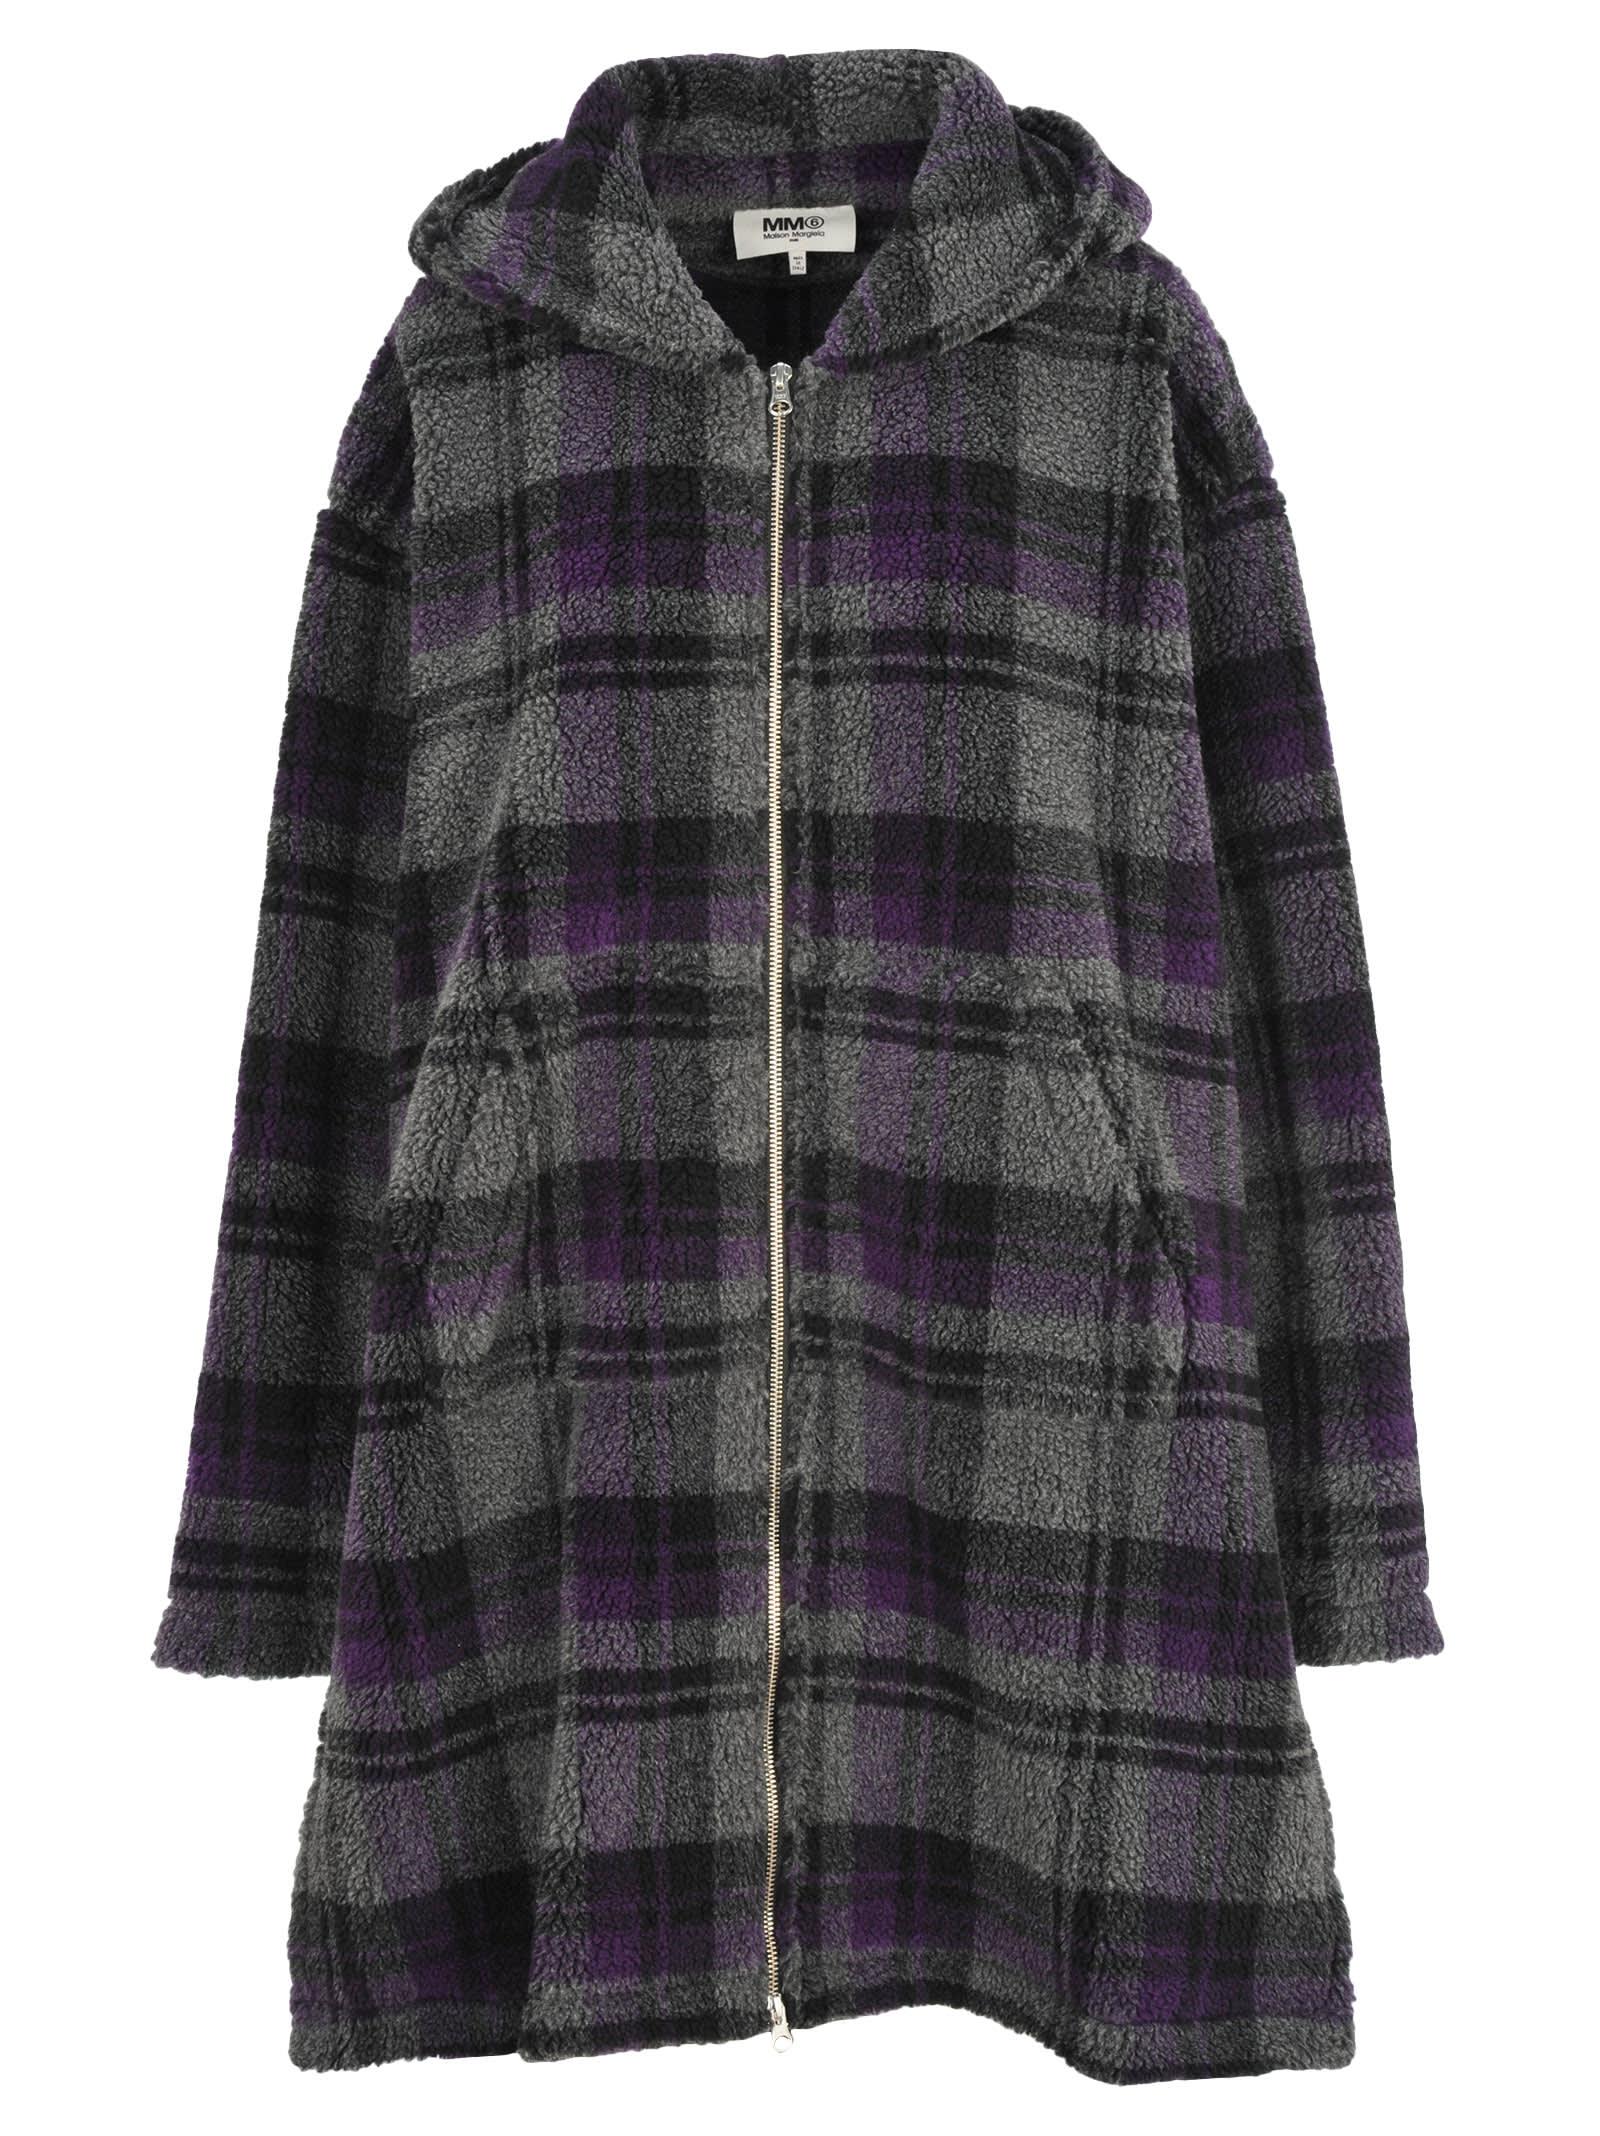 Mm6 Oversized Coat